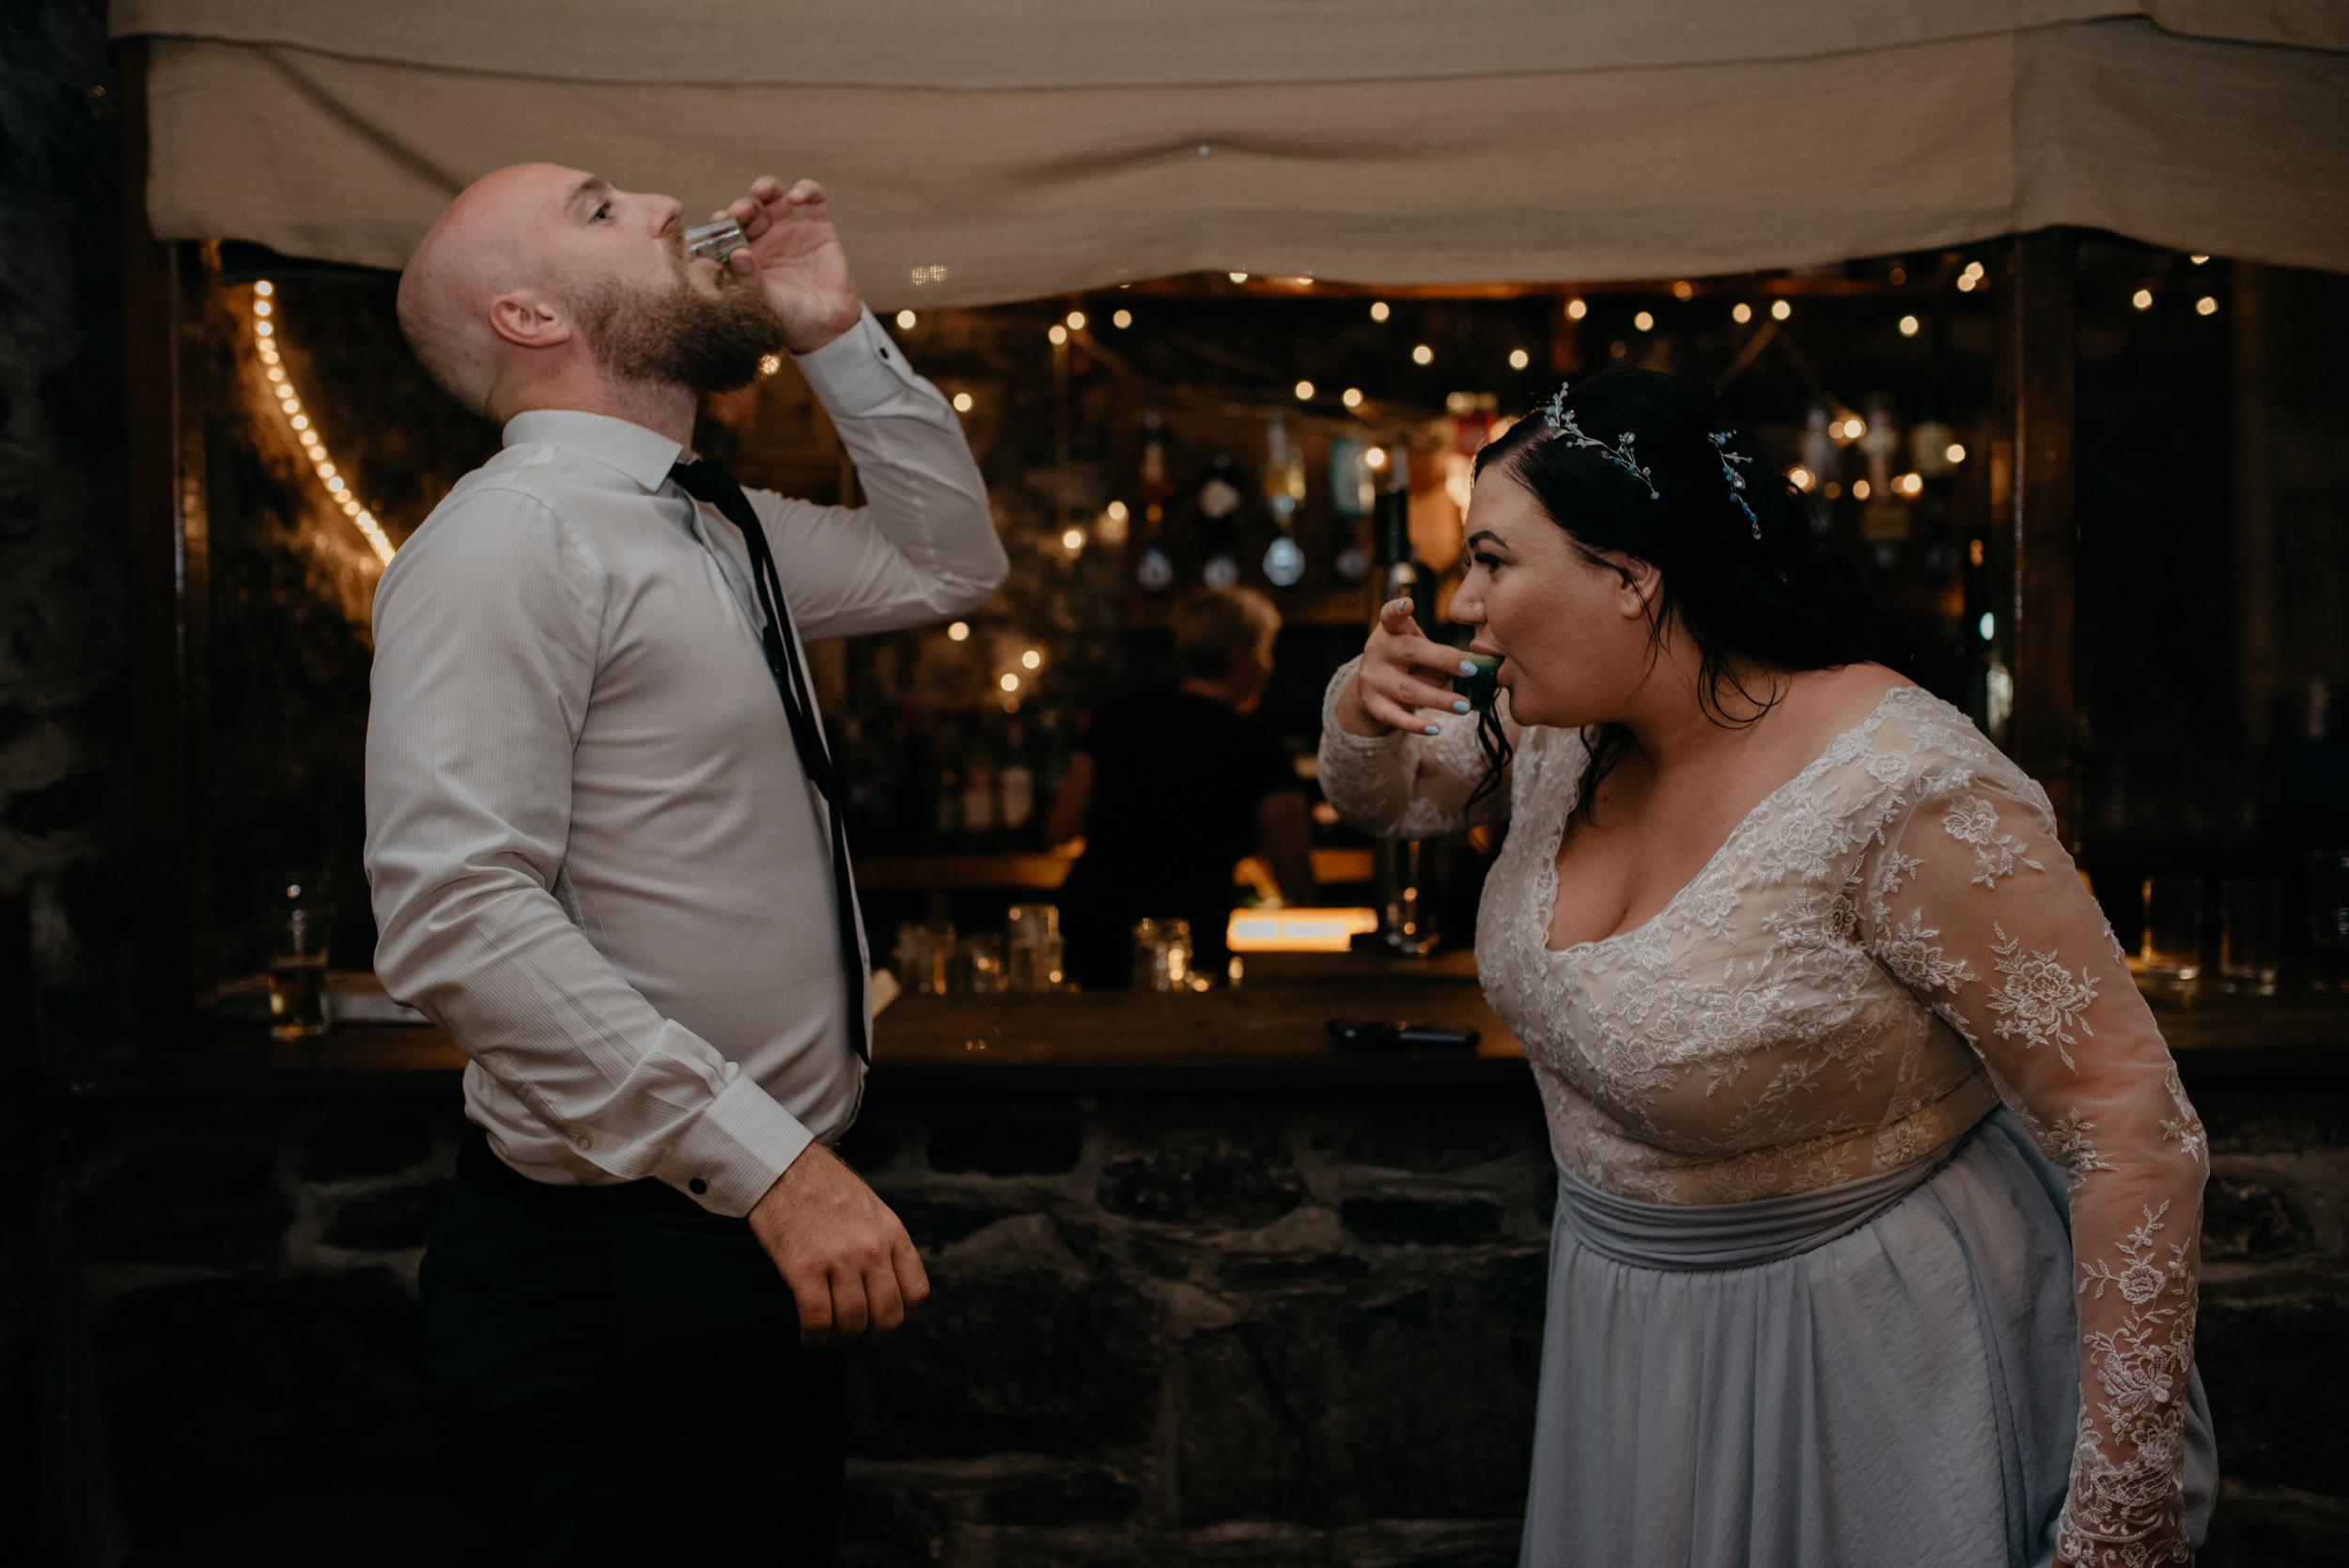 Wedding reception at Vaughn's Pub. County Clare, Ireland wedding photographer.